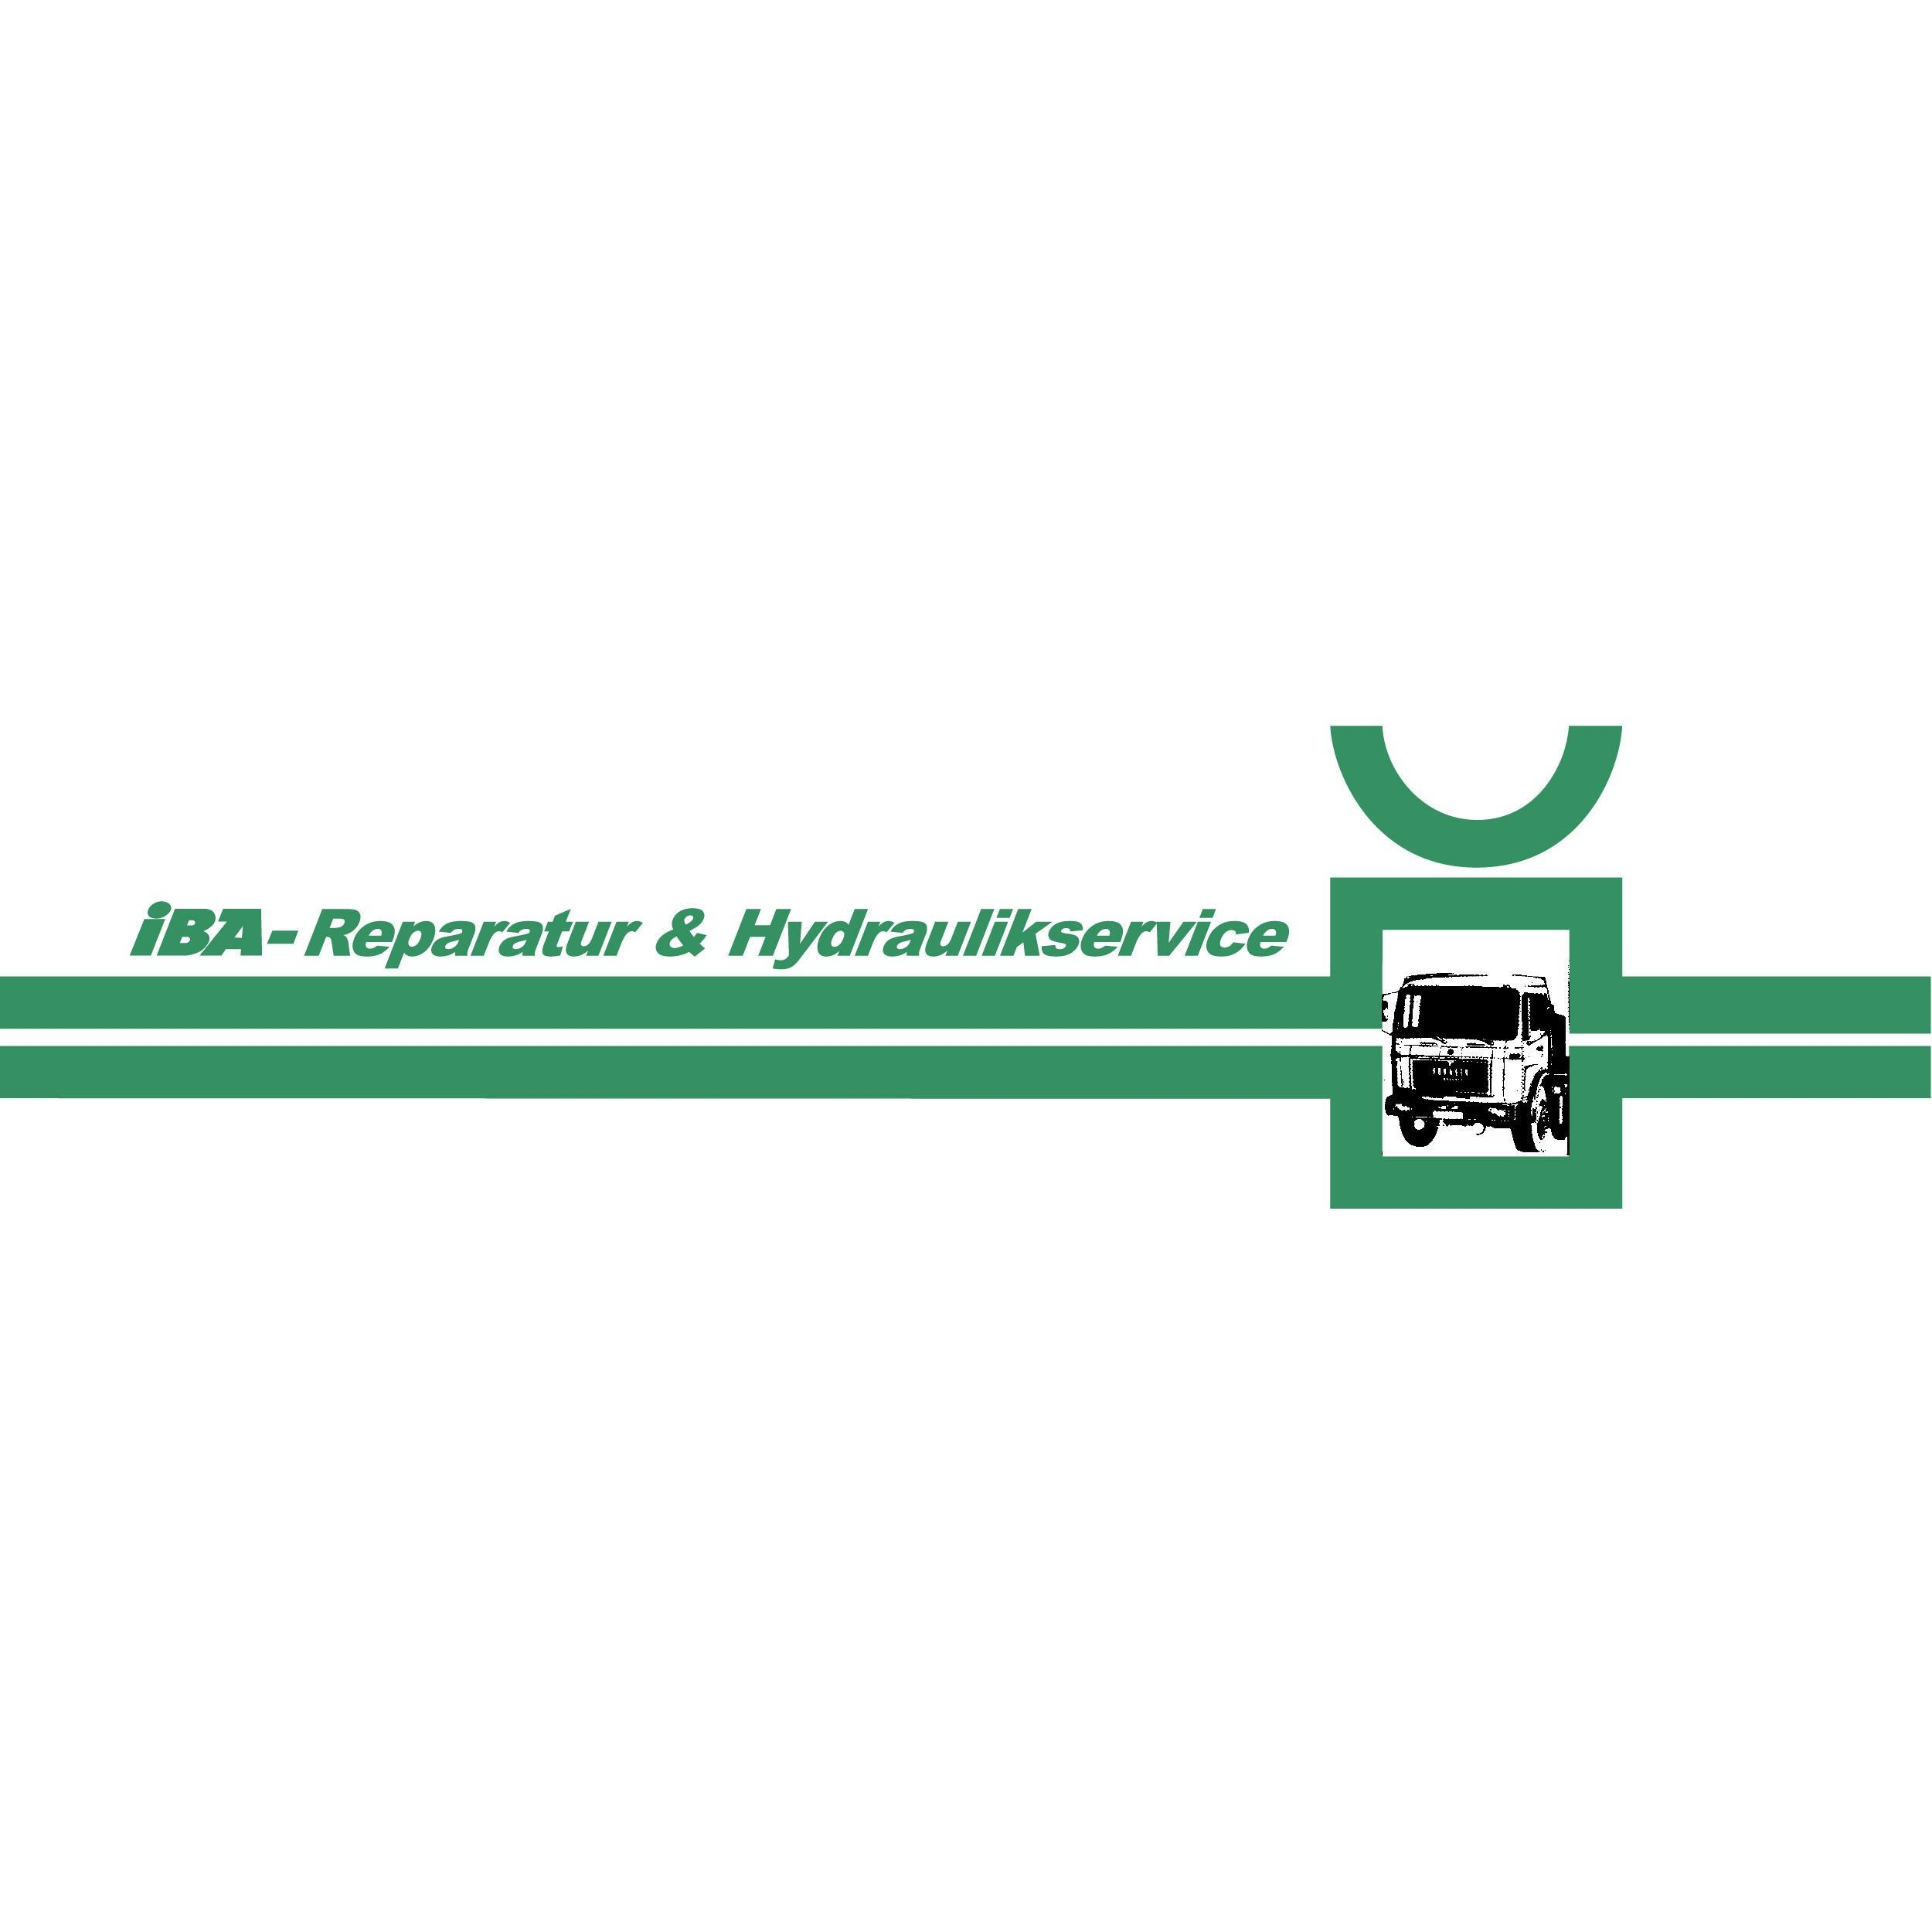 iBA-Nutzfahrzeug Reparatur & Hydraulikservice